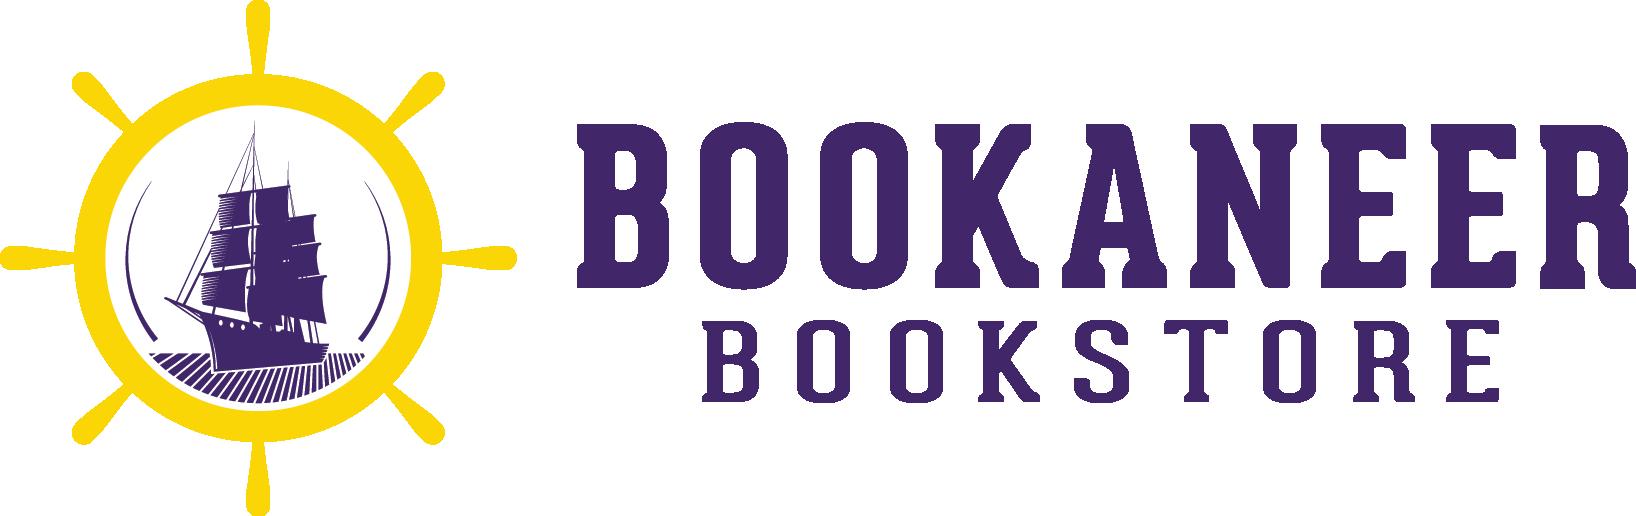 Bookaneer Bookstore Logo